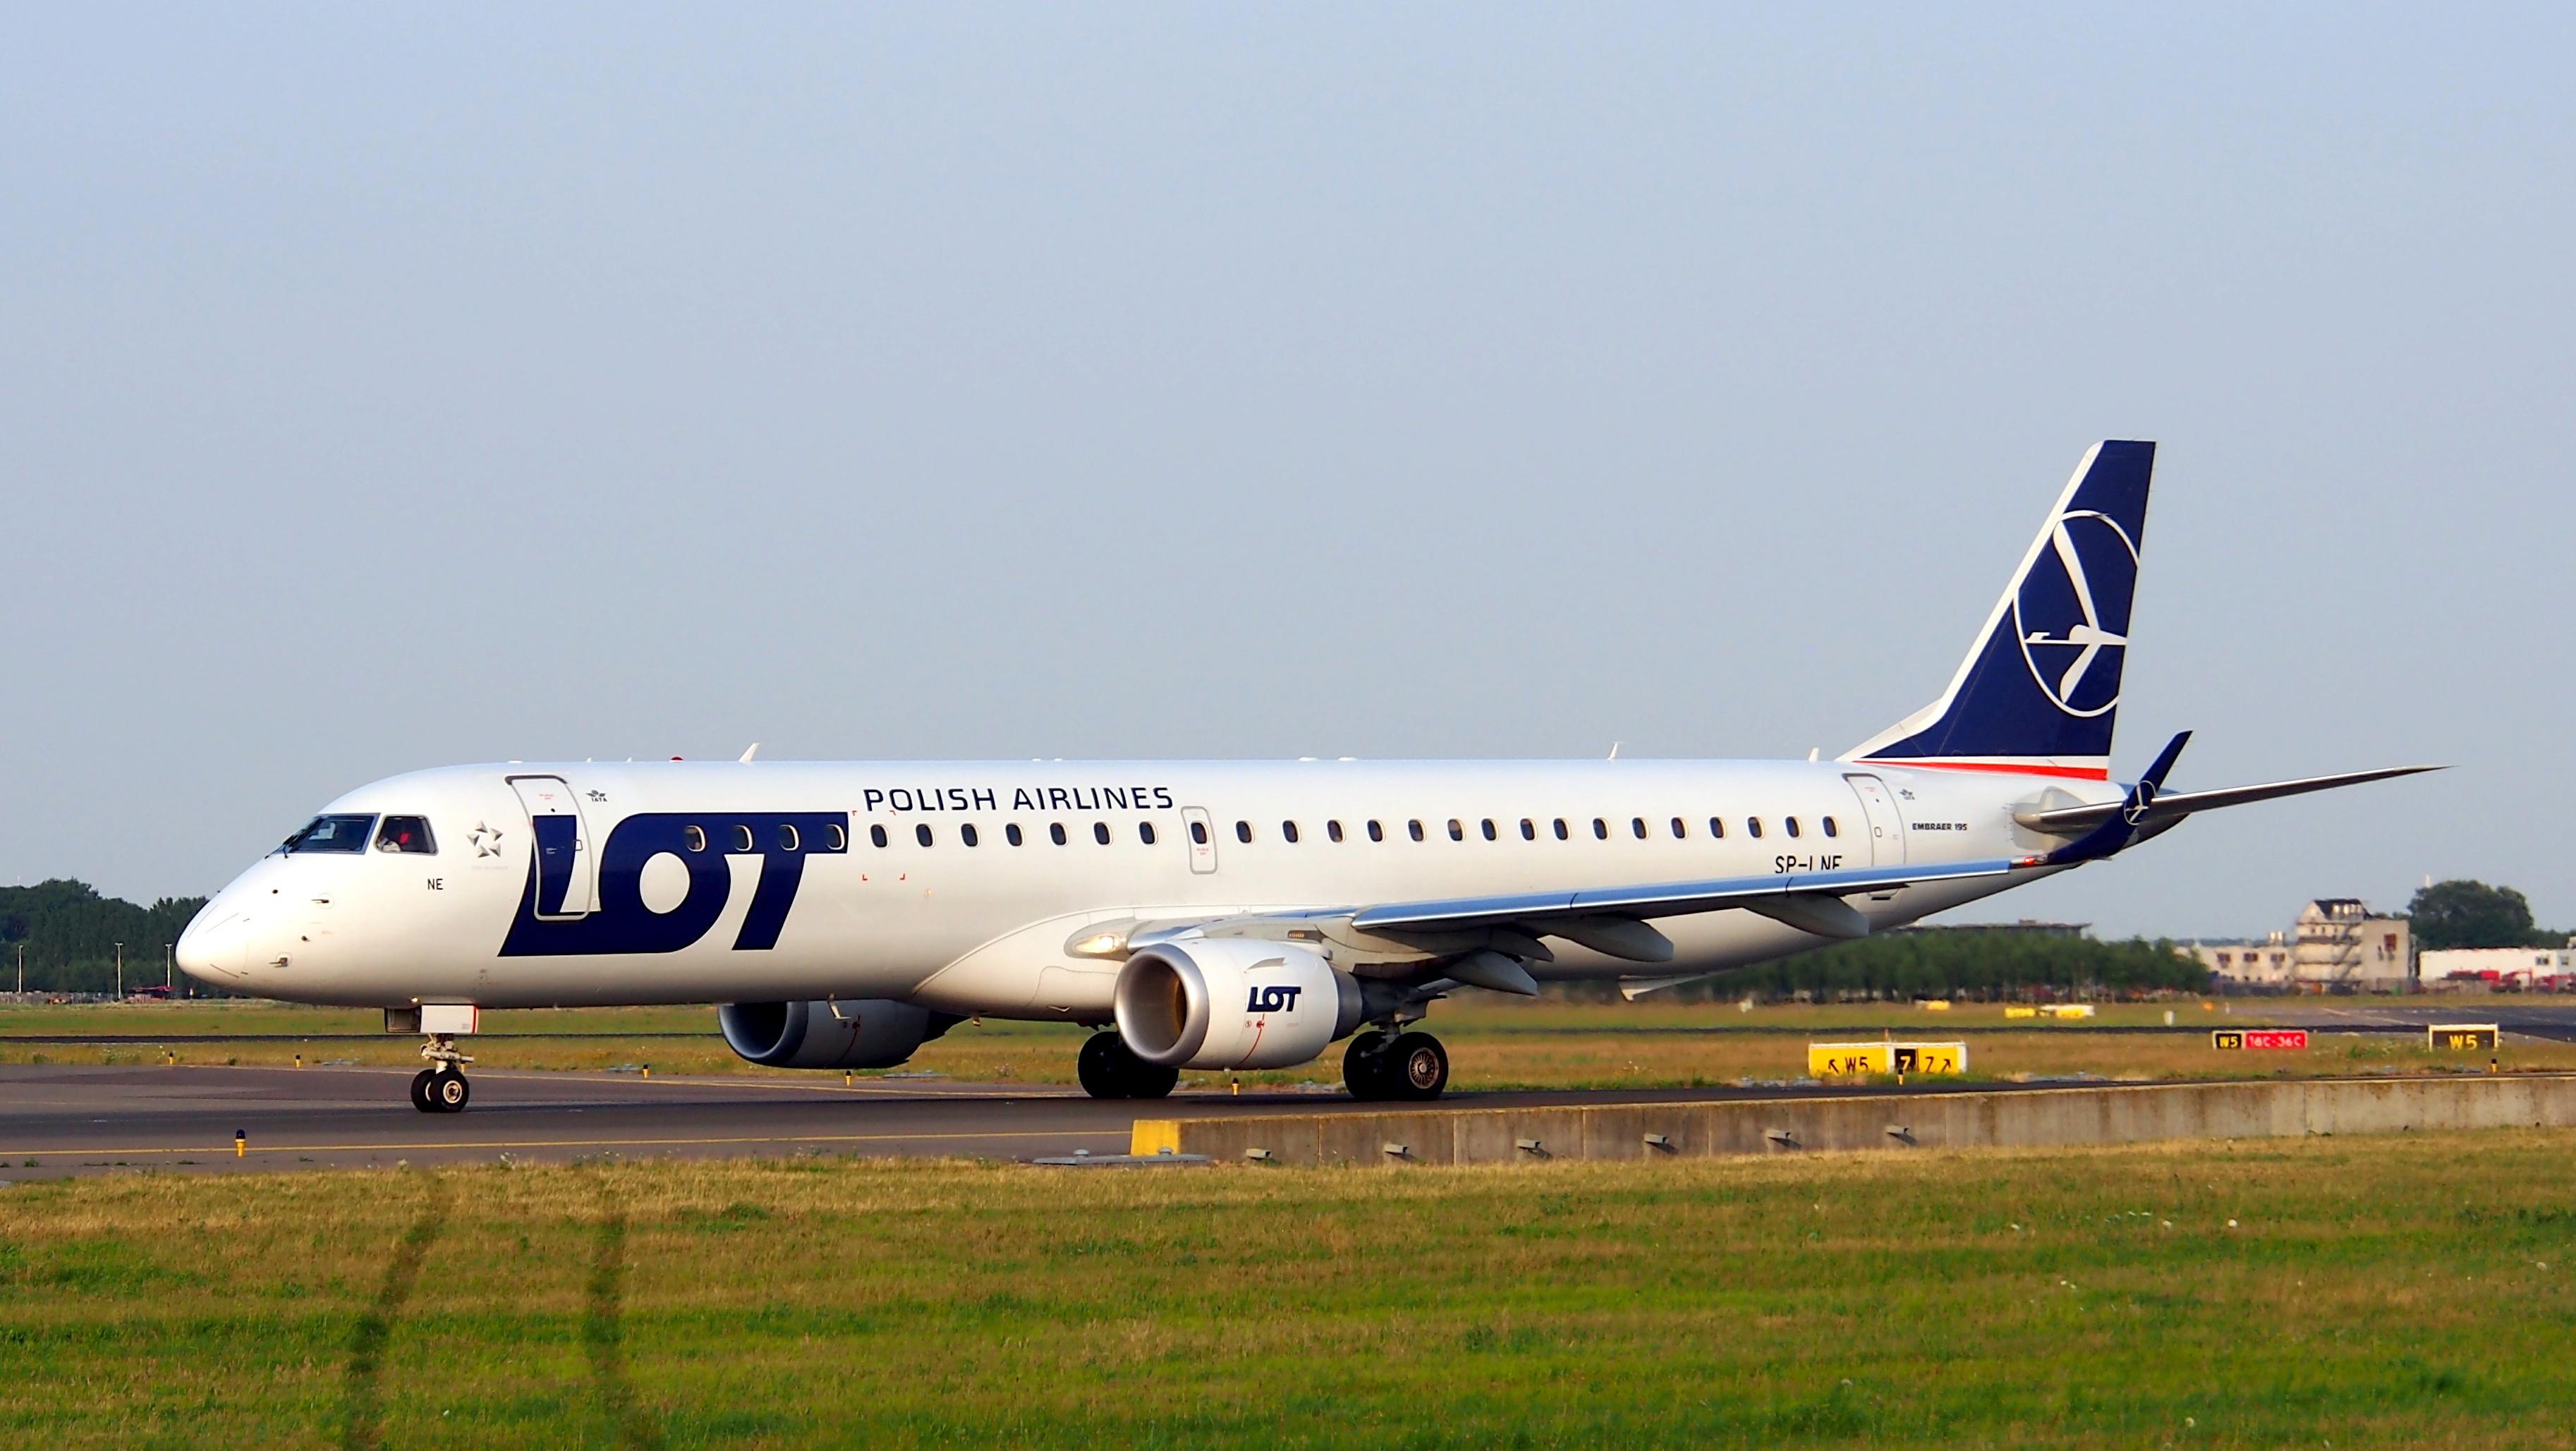 sp-lne_lot_polish_airlines_embraer_erj-195lr_erj-190-200_lr_cn_19000583_taxiing_22july2013_pic-002.JPG